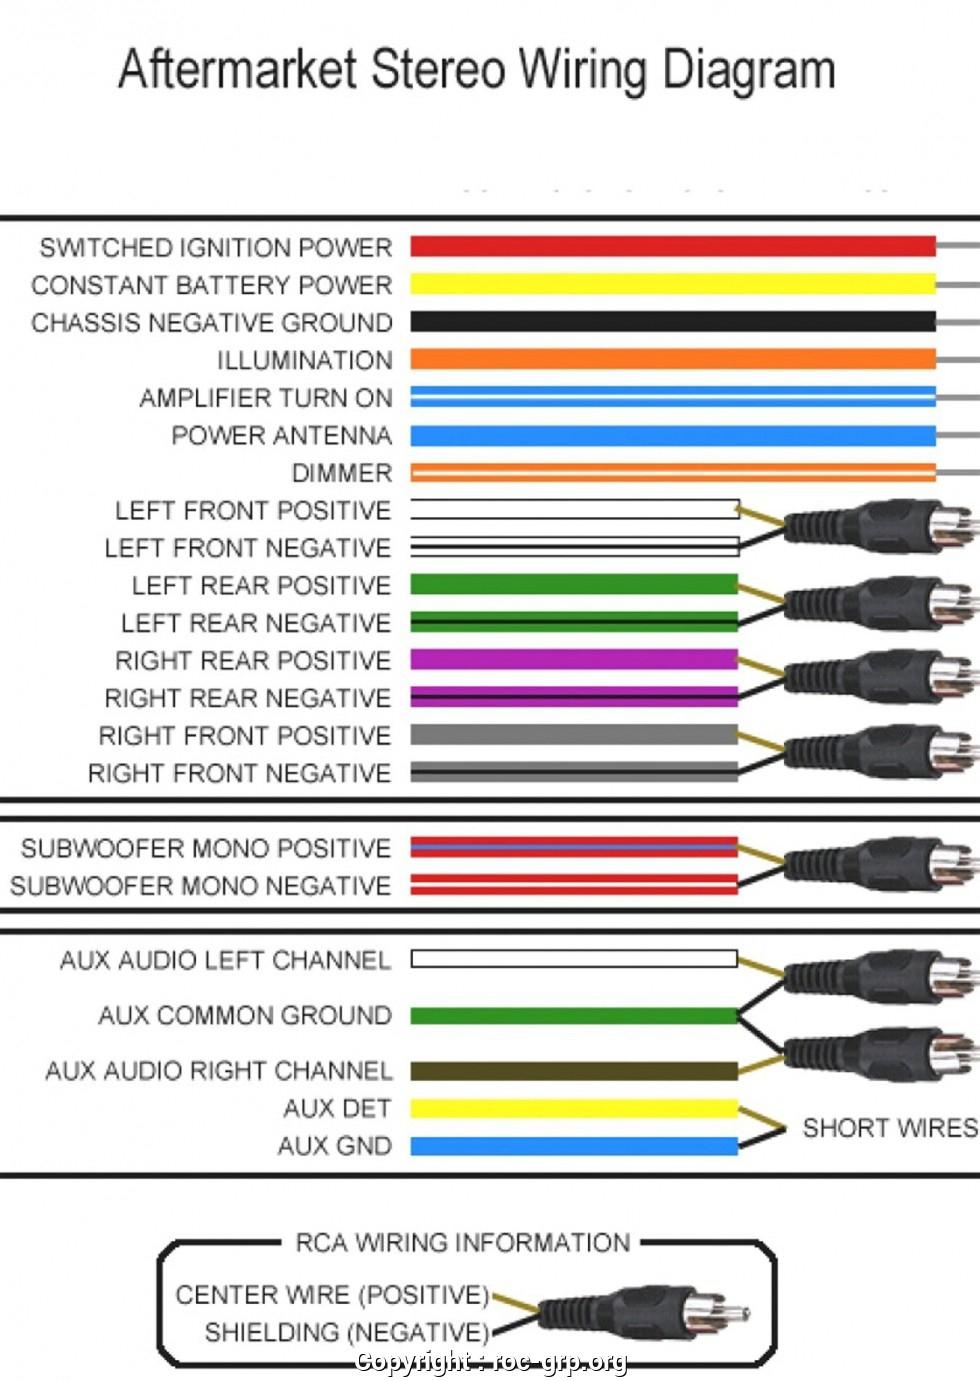 Dual Stereo Wiring Diagram - Data Wiring Diagram Site - Dual Xdm280Bt Wiring Diagram